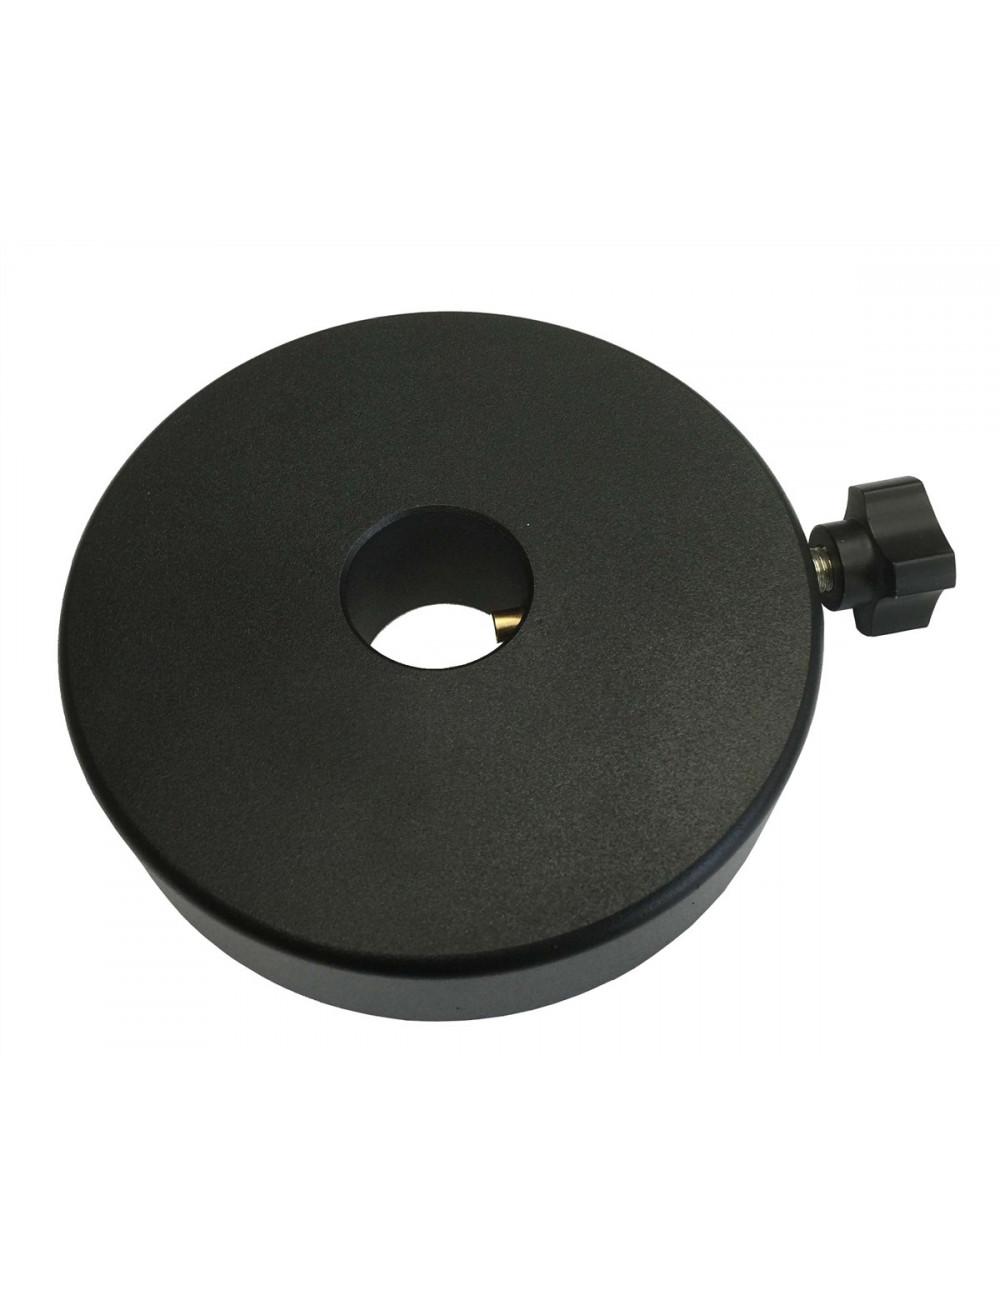 Contrepoids 2,5kg iOptron pour GEM45/iEQ45/CEM60